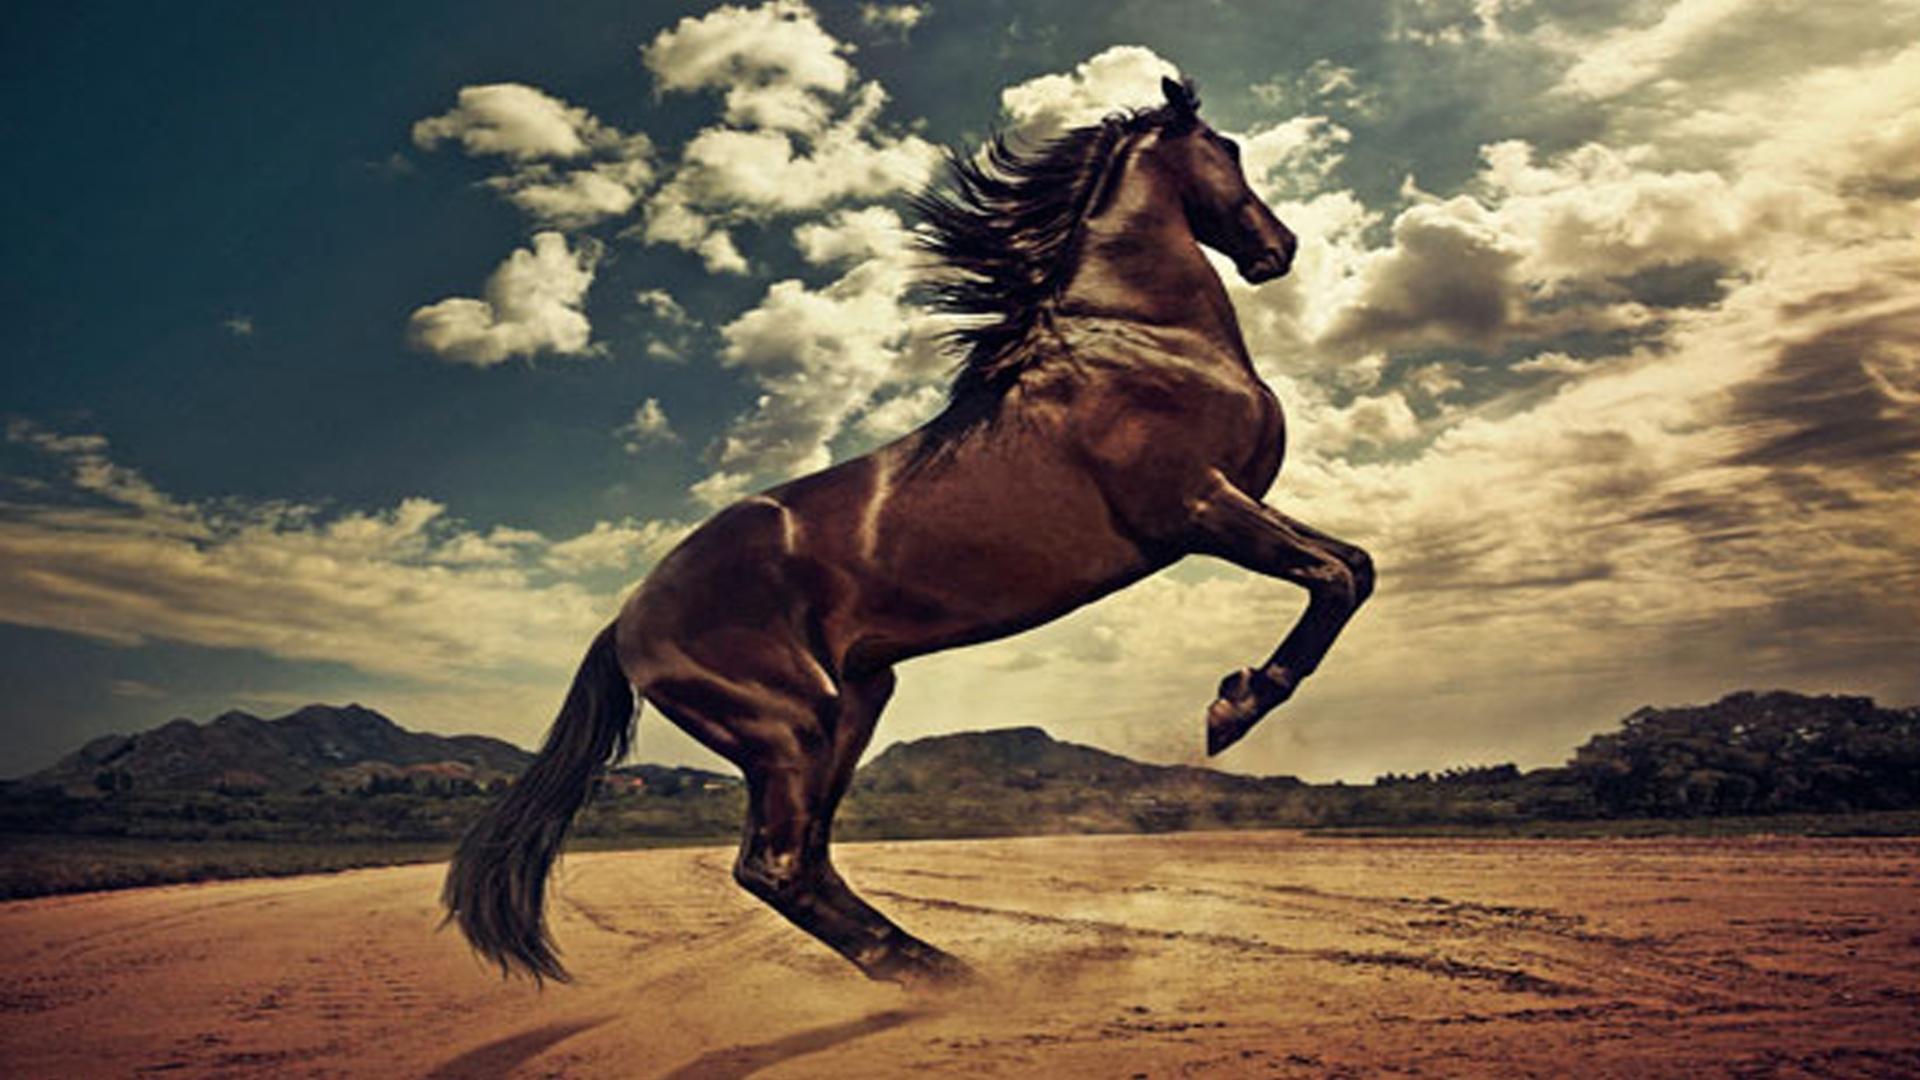 Wild Tiger Hd Wallpaper Steigende Pferd Hd Desktop Hintergrund Widescreen High